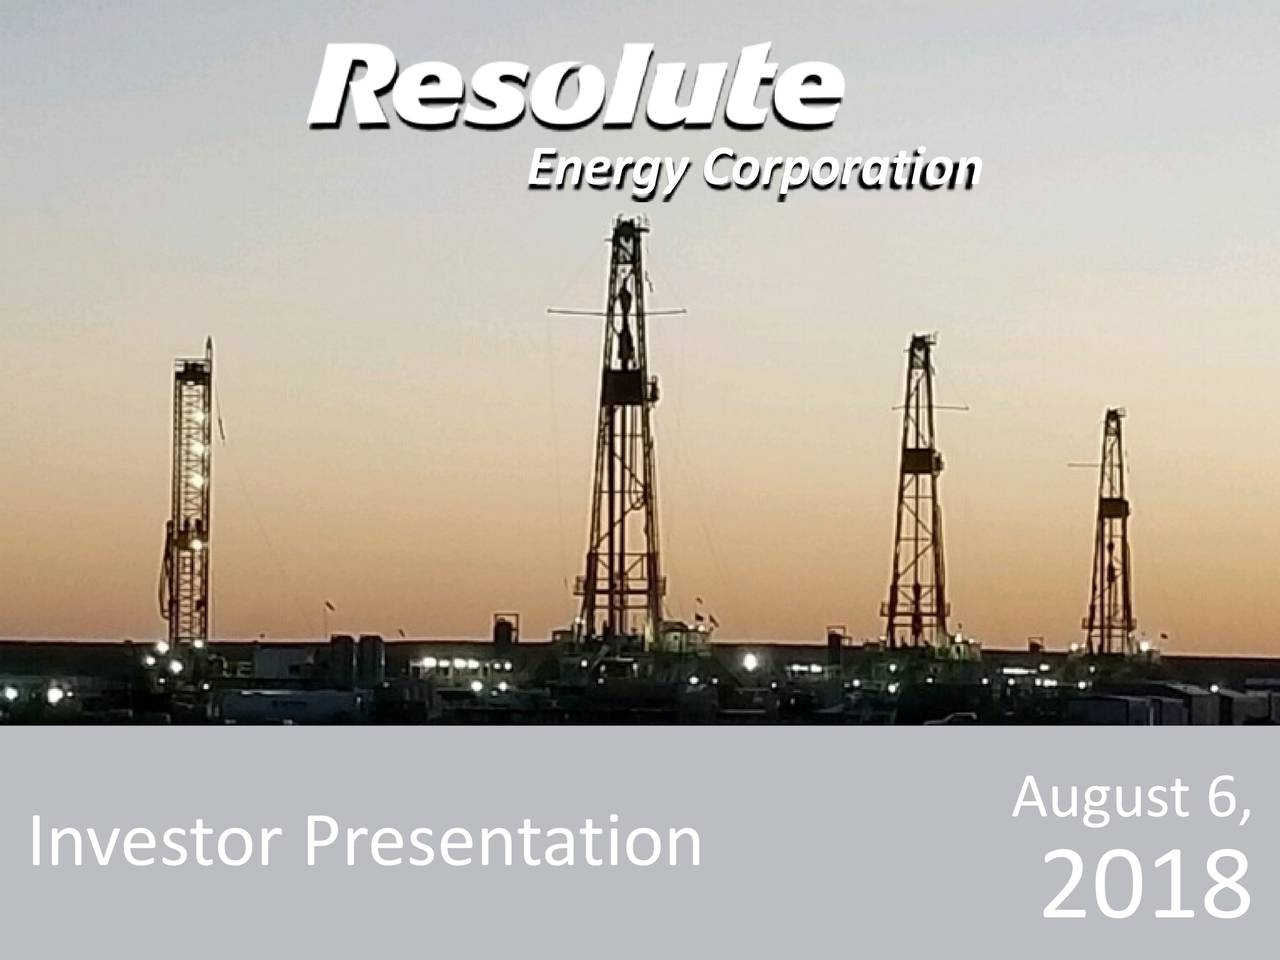 August 6, Investor Presentation 2018